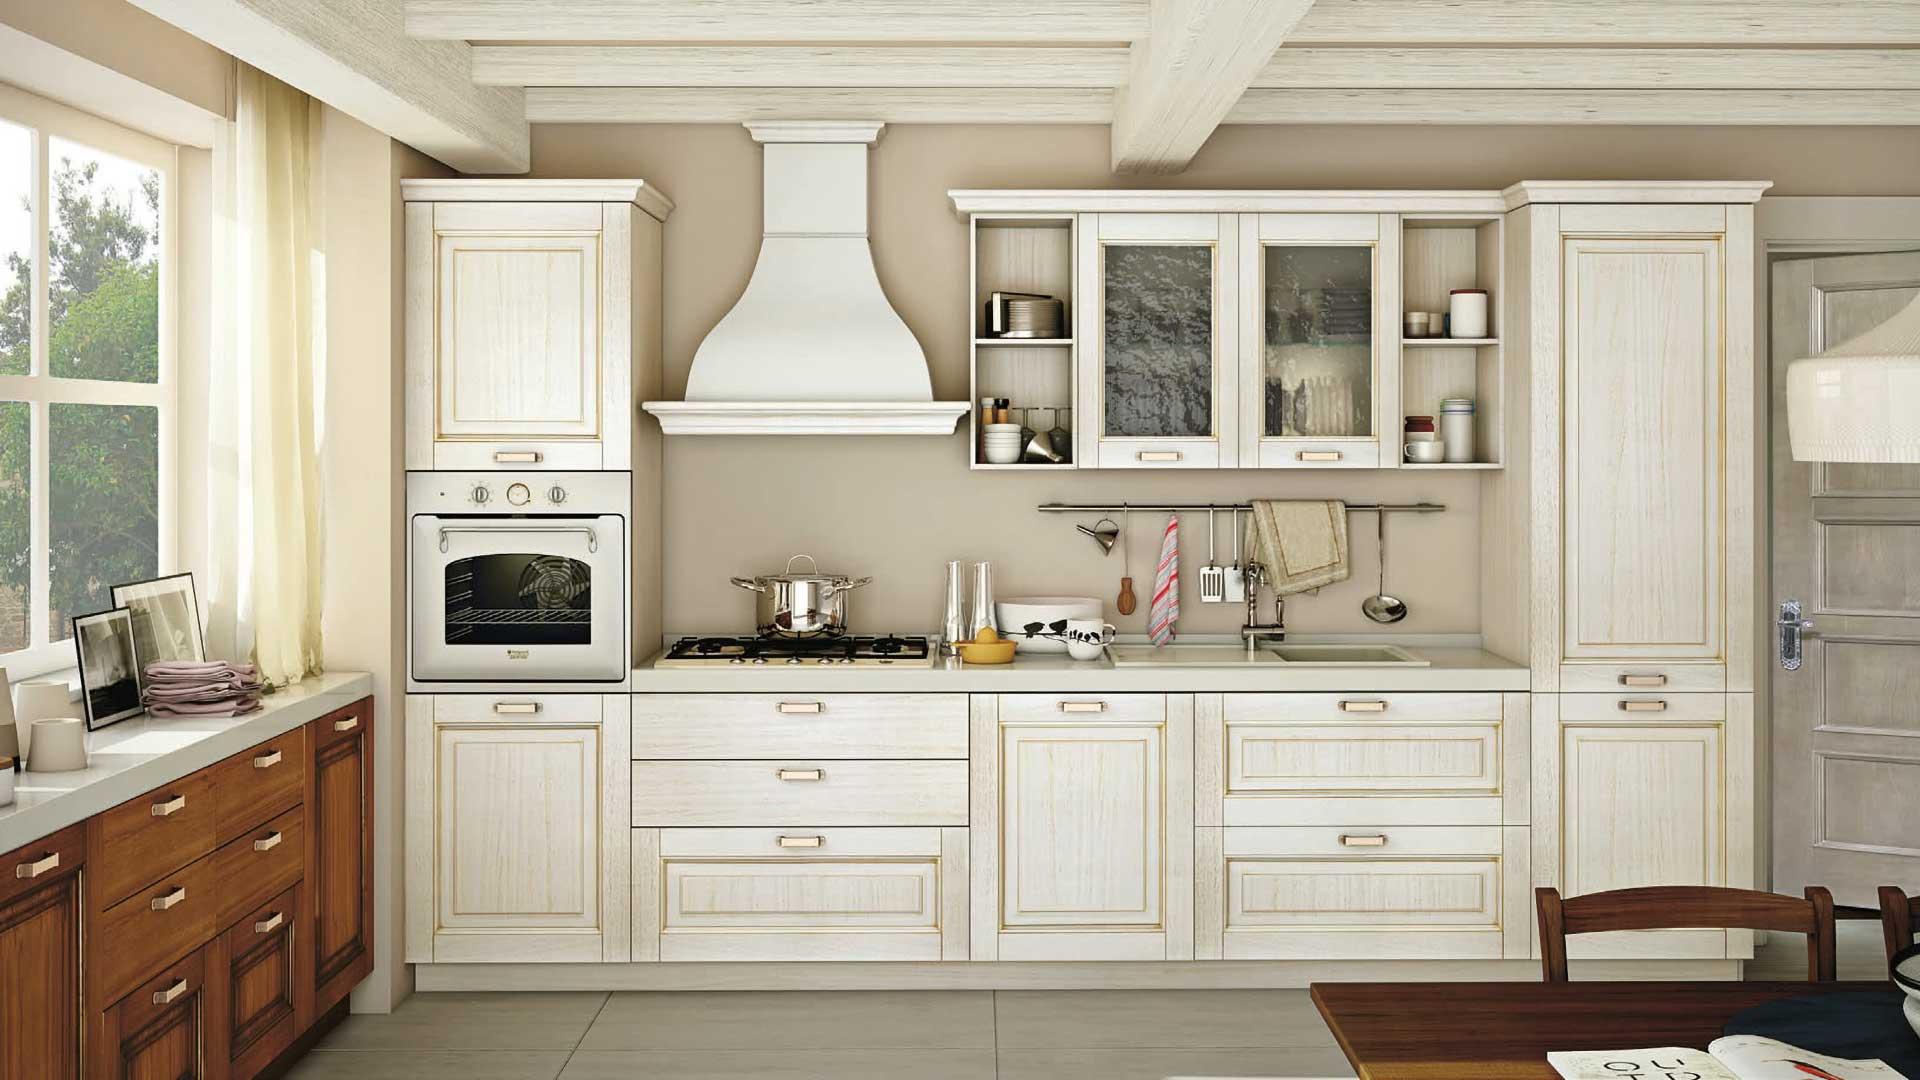 Oprah - Cucine Classiche - Creo Kitchens